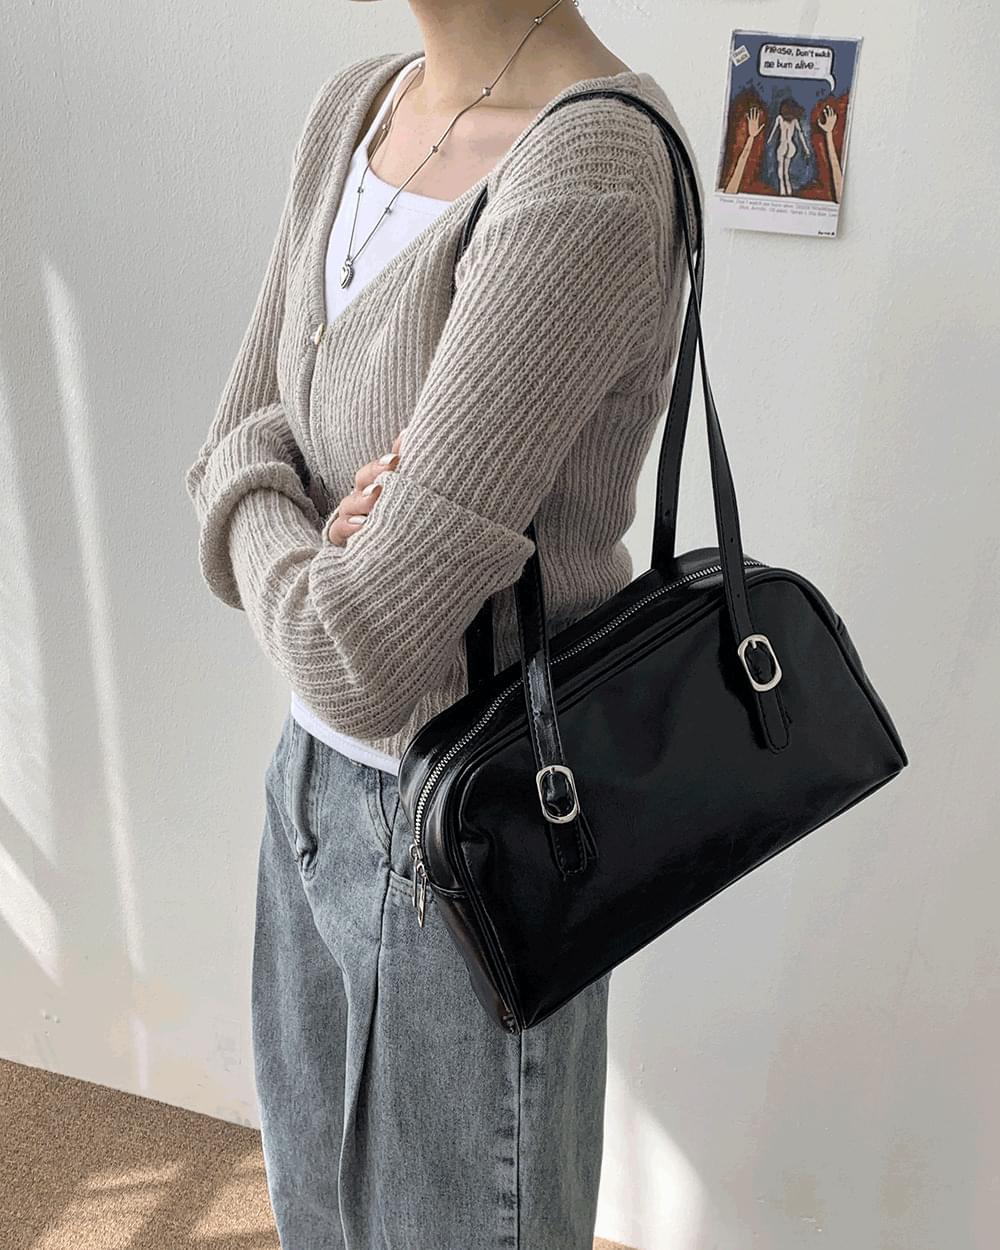 Bookie Mini Baguette School Look Shoulder Bag